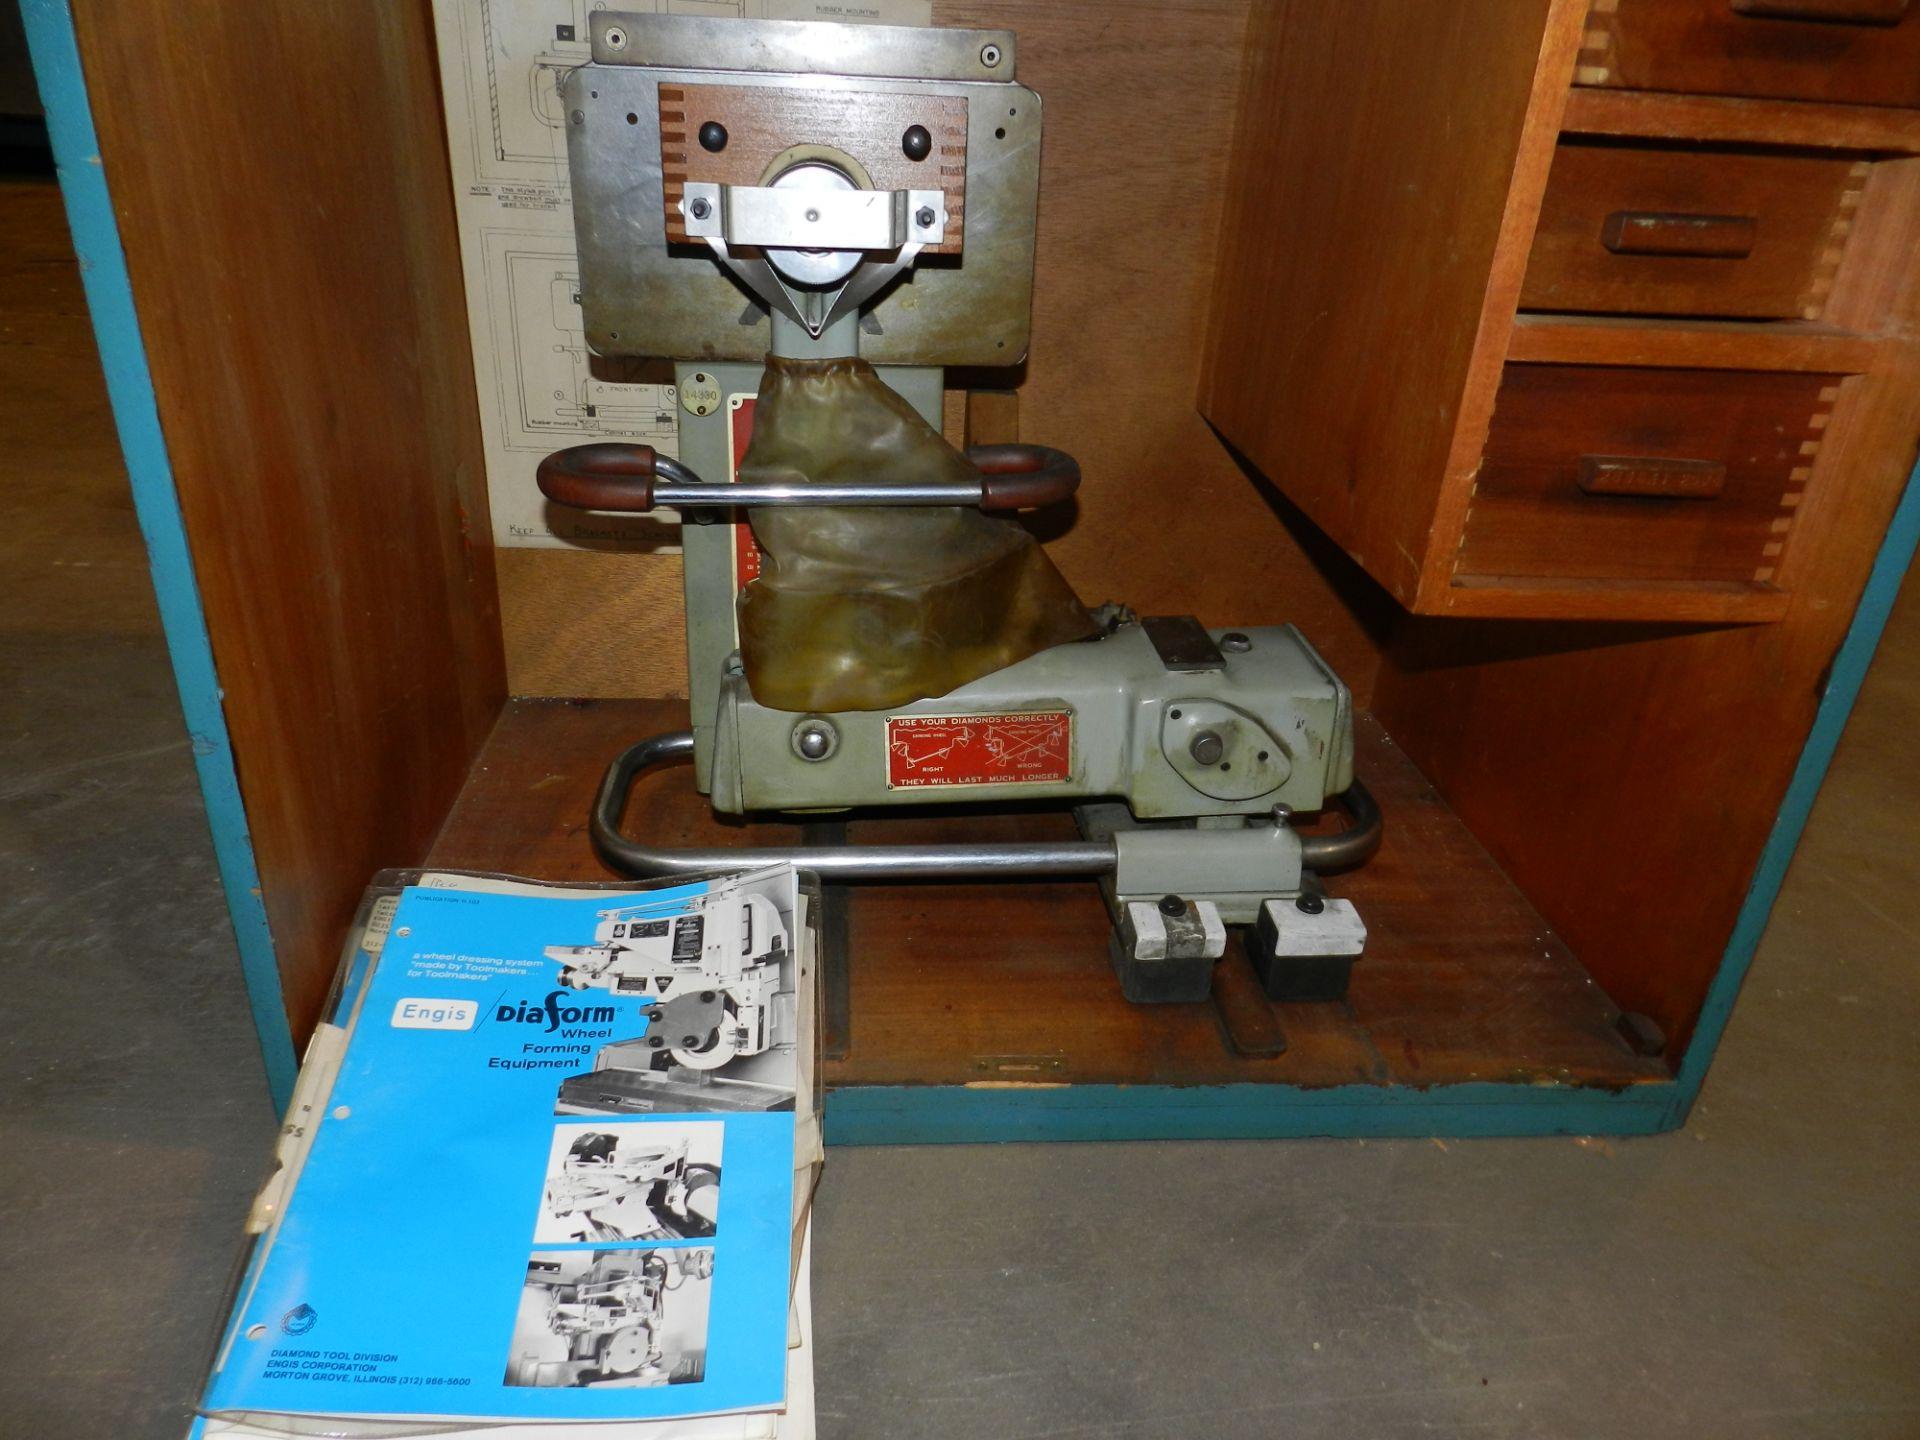 Lot 49 - Pratt & Whitney Diaform Pantograph Grinding Wheel Dresser Model AT